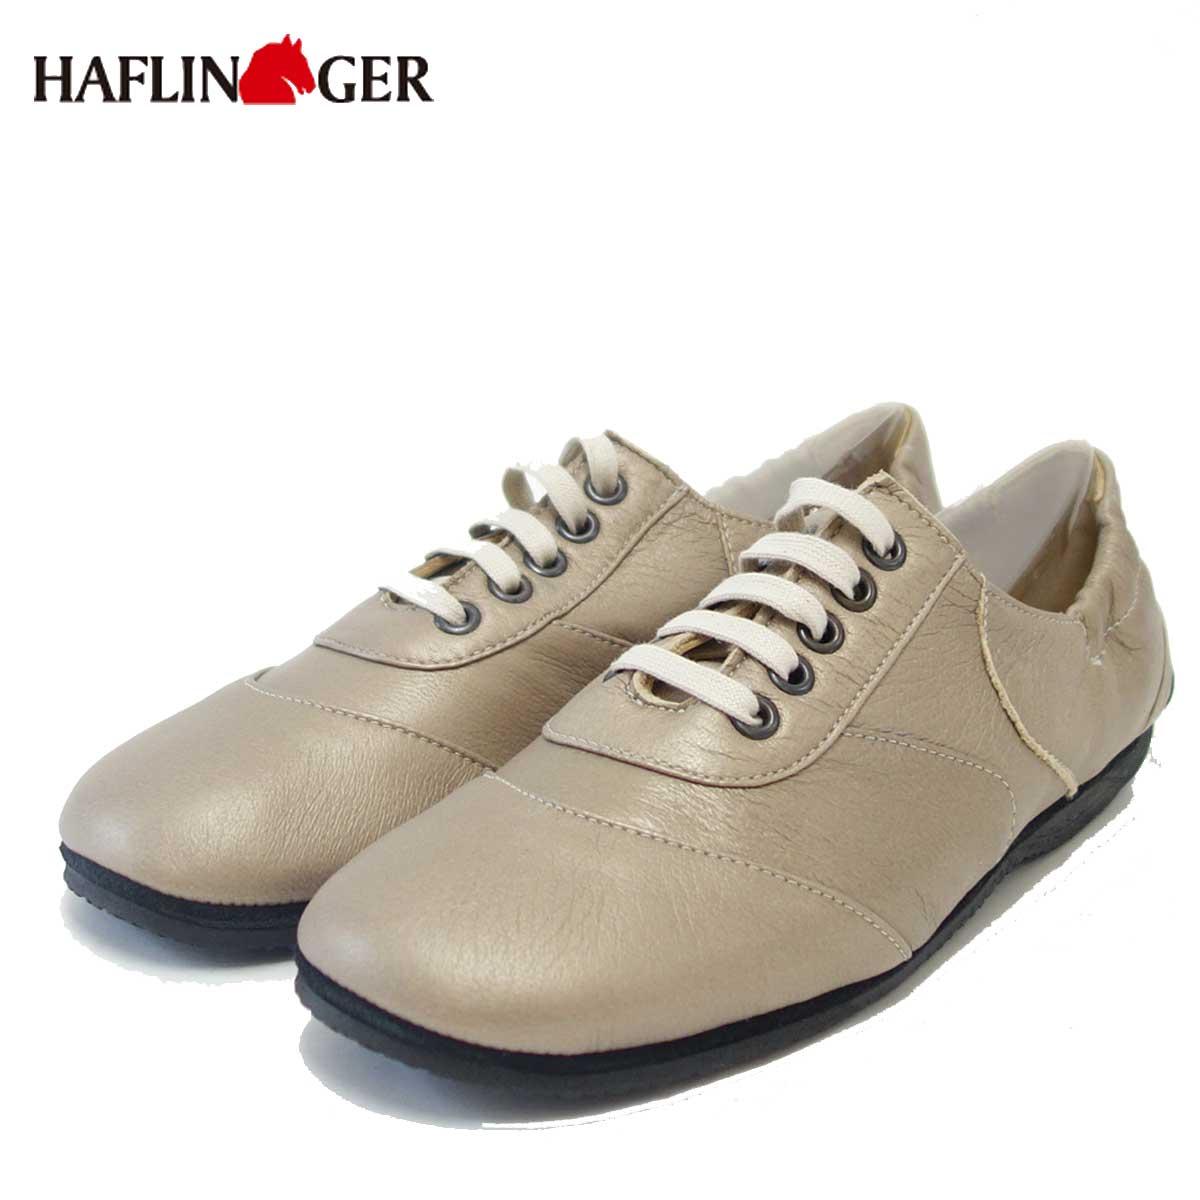 HAFLINGER ハフリンガー テイラー HL 45200205 チタン 「靴」